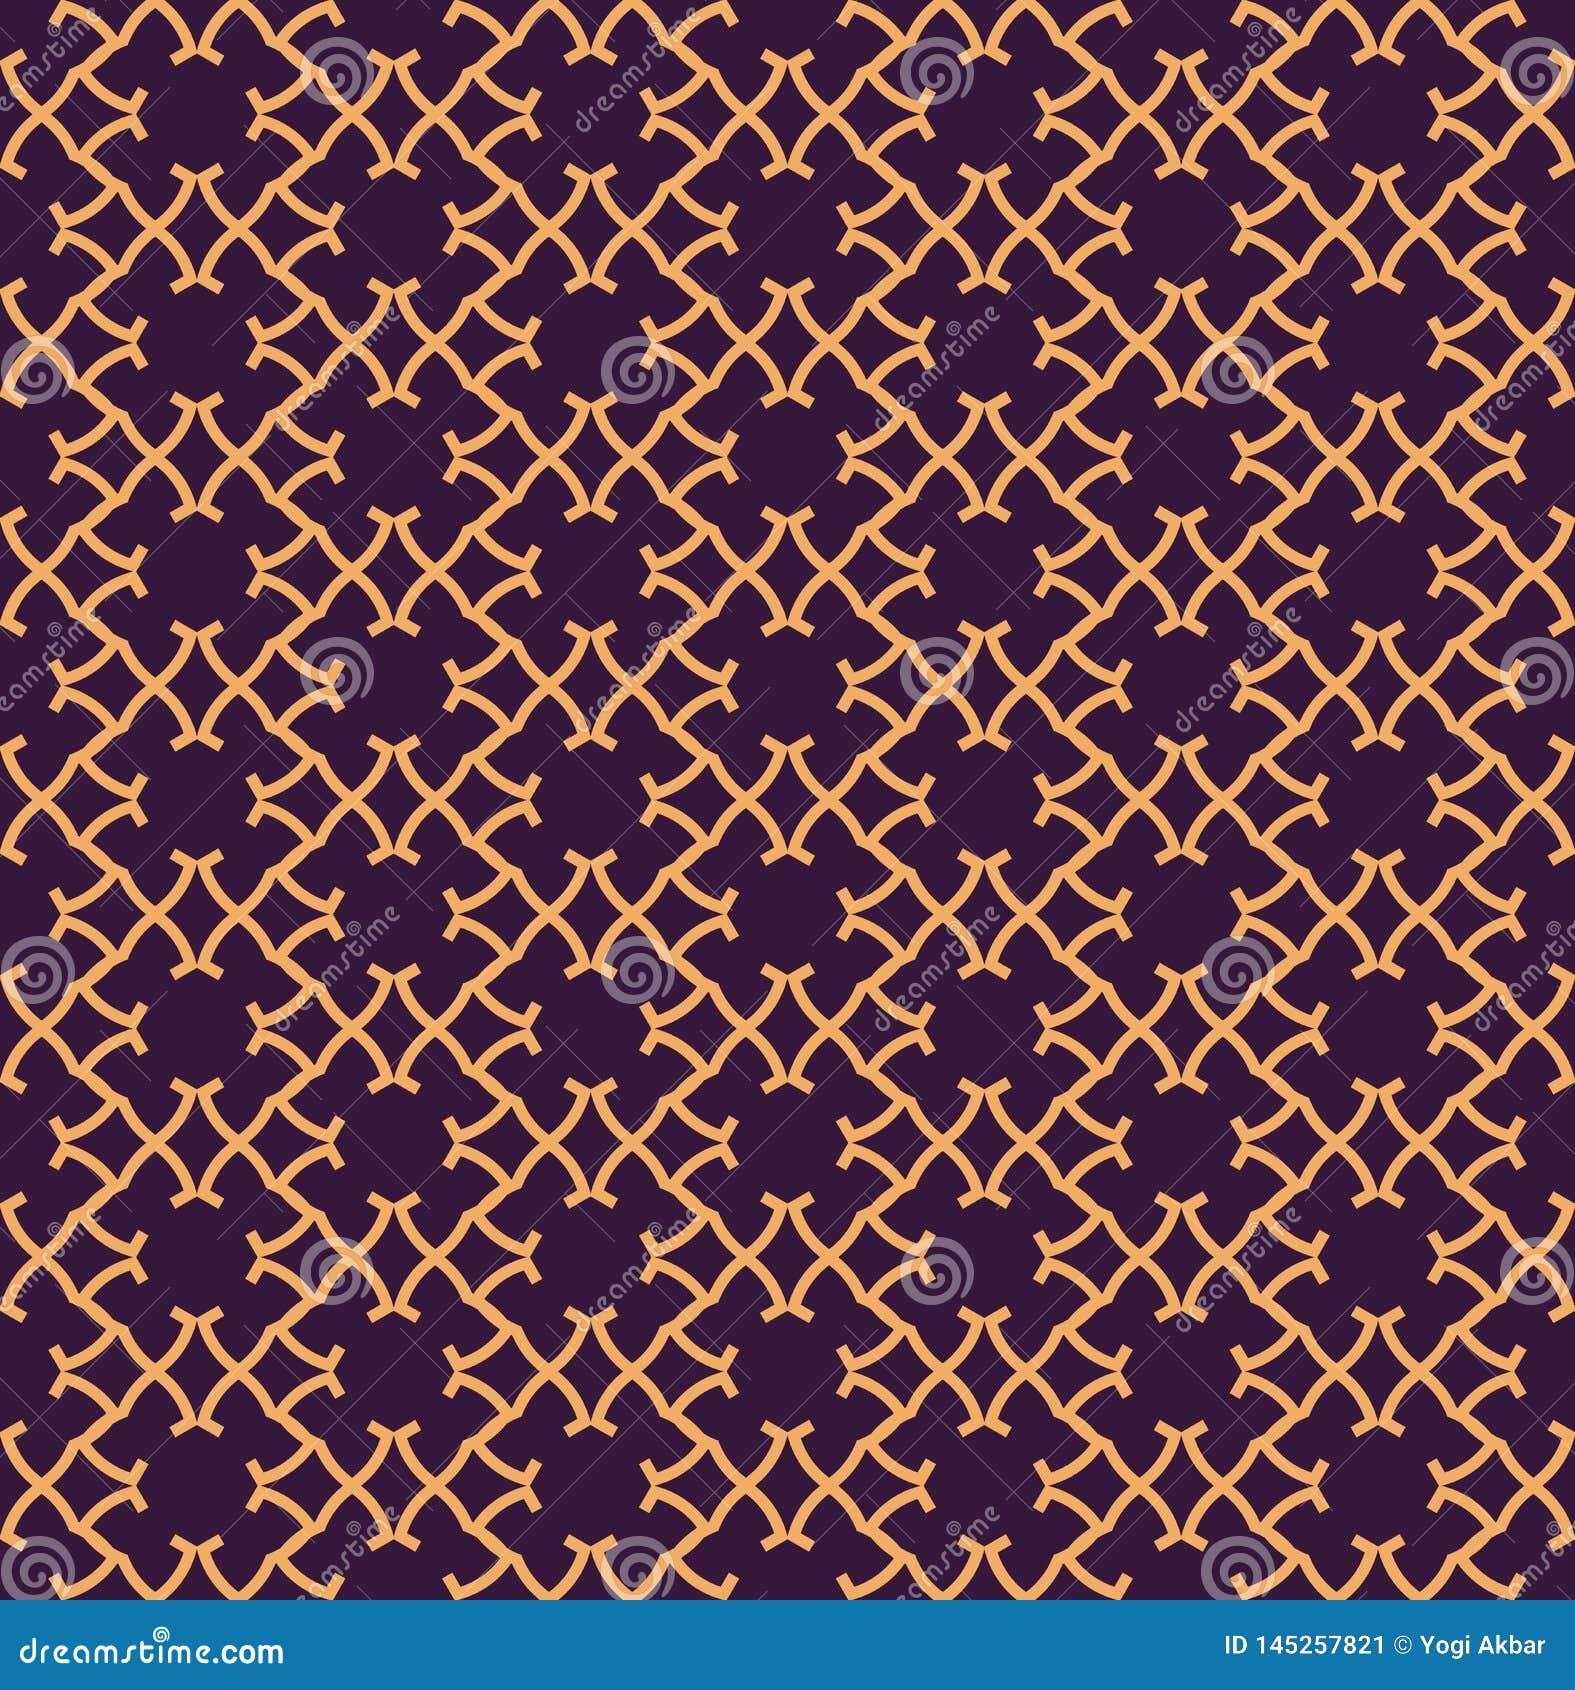 Luxury Geometric Pattern. Vector seamless pattern. Modern linear stylish texture. Geometric striped ornament